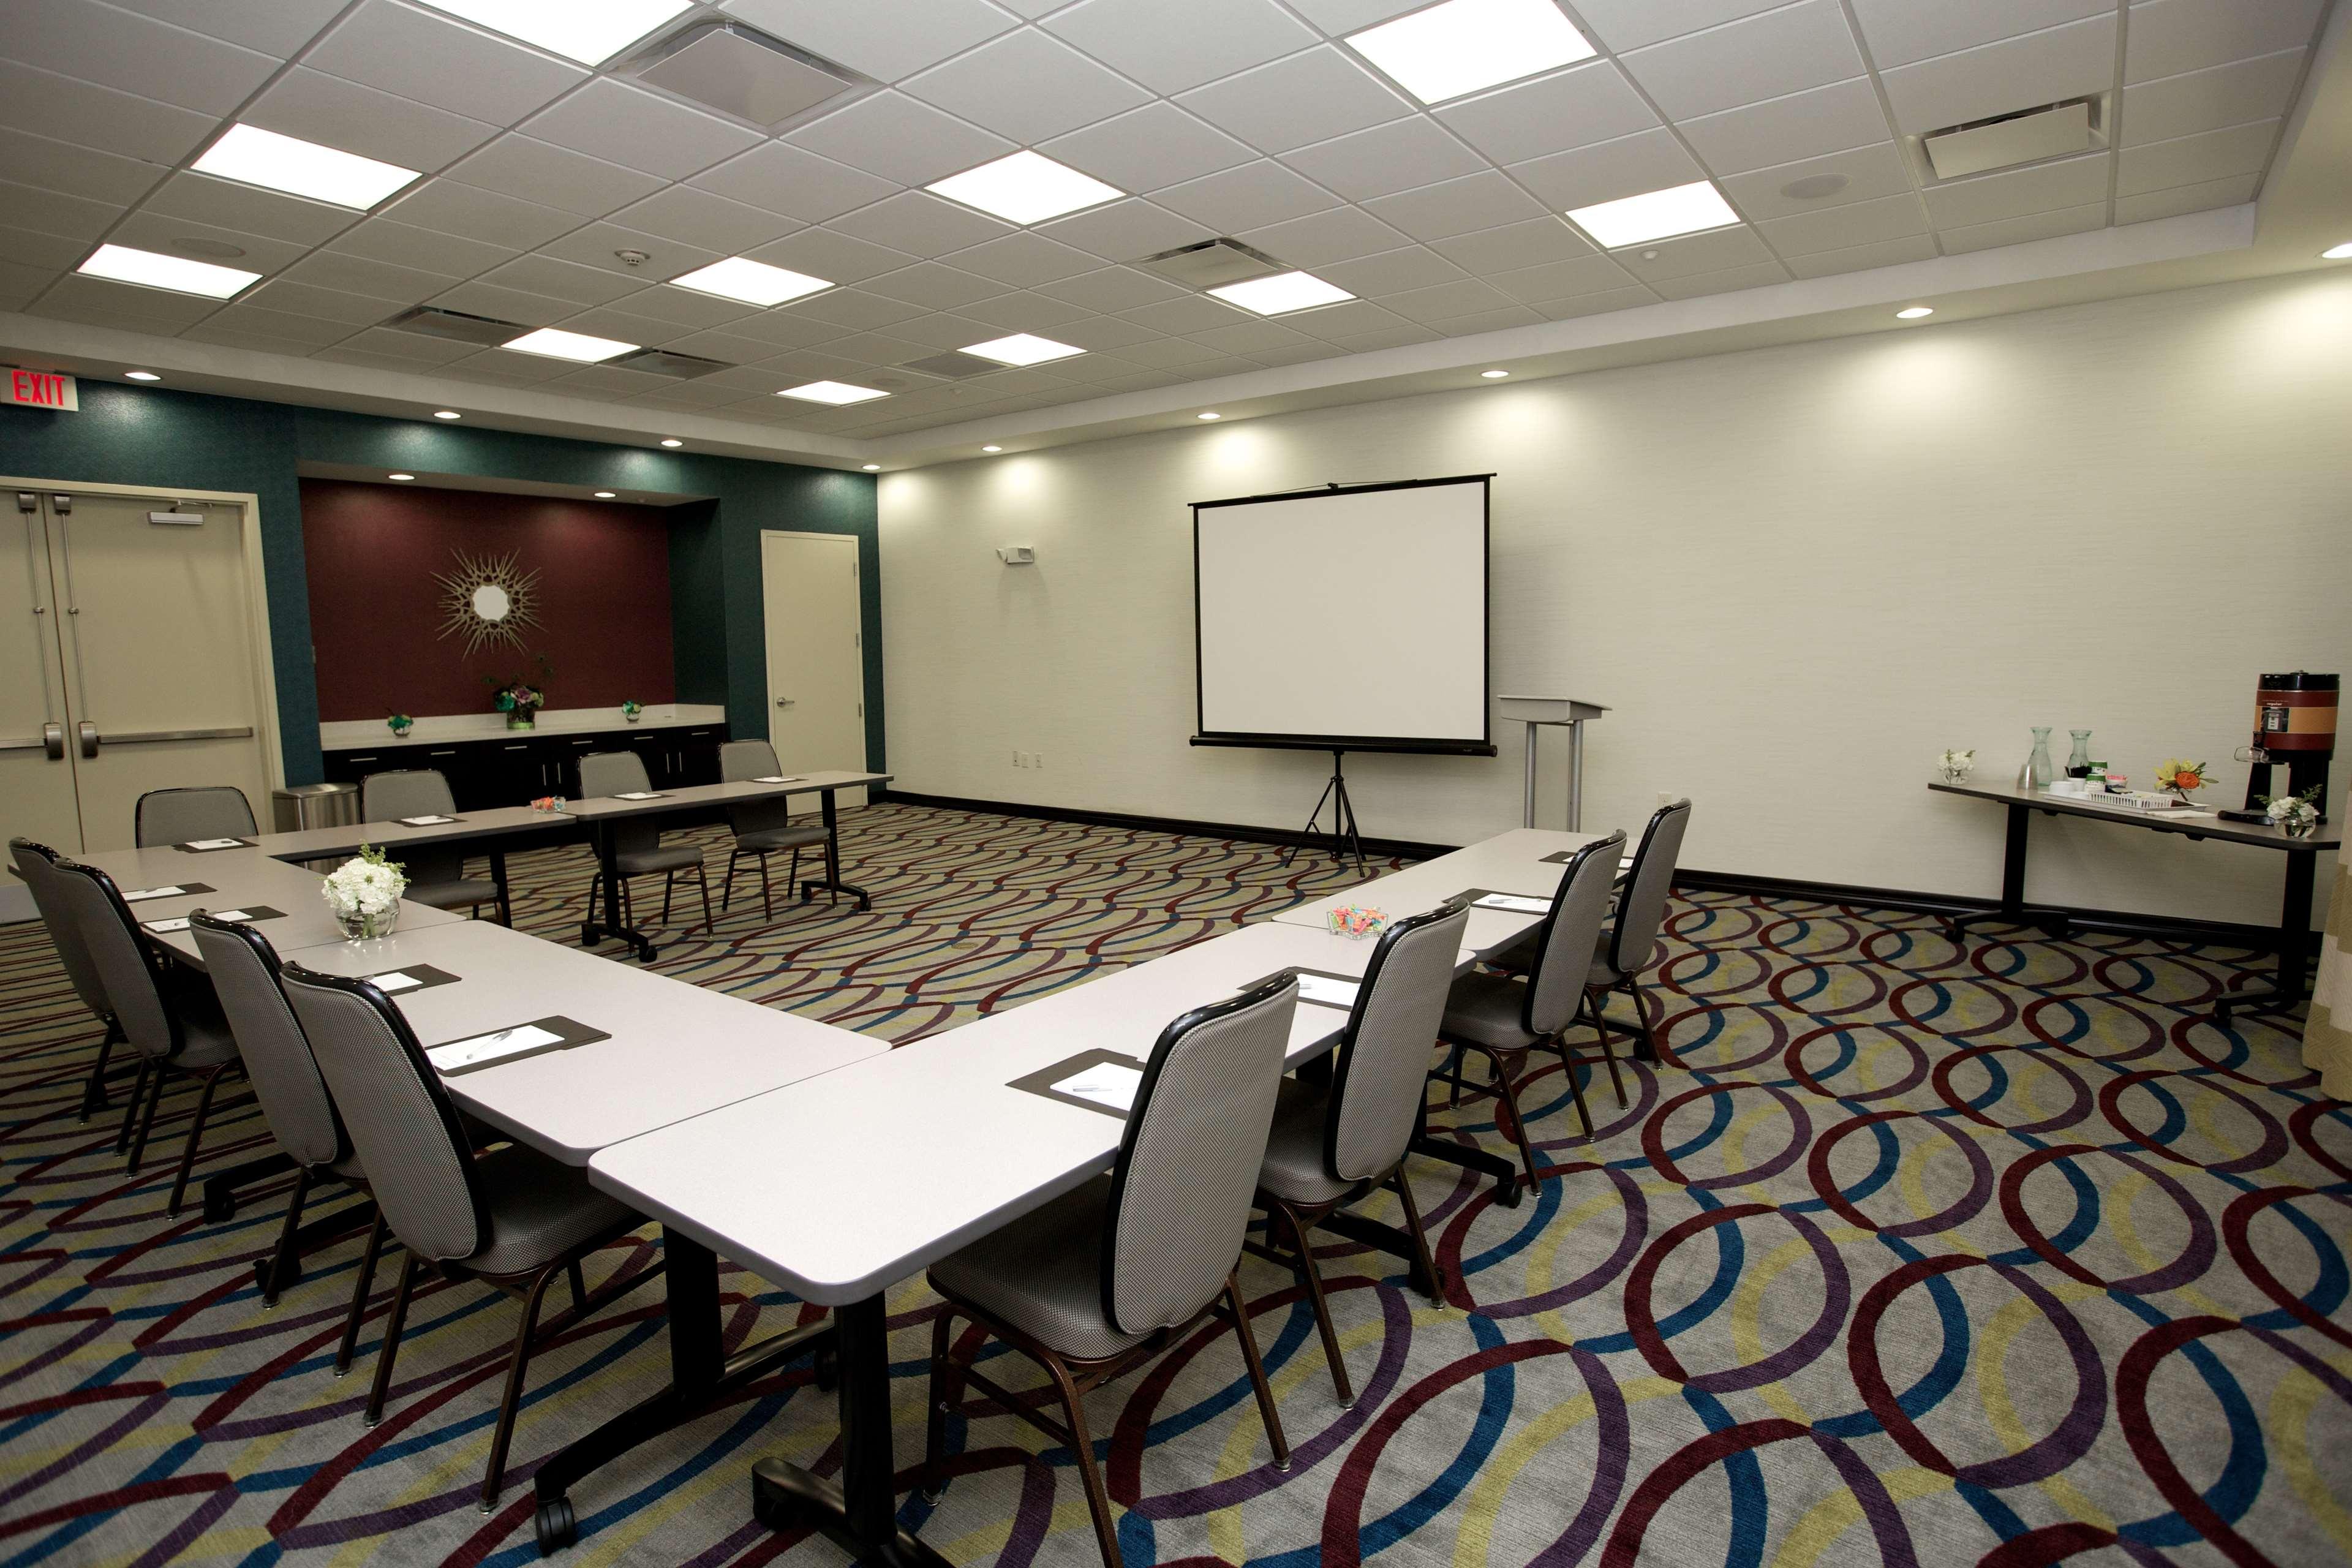 Hampton Inn & Suites Missouri City, TX image 41